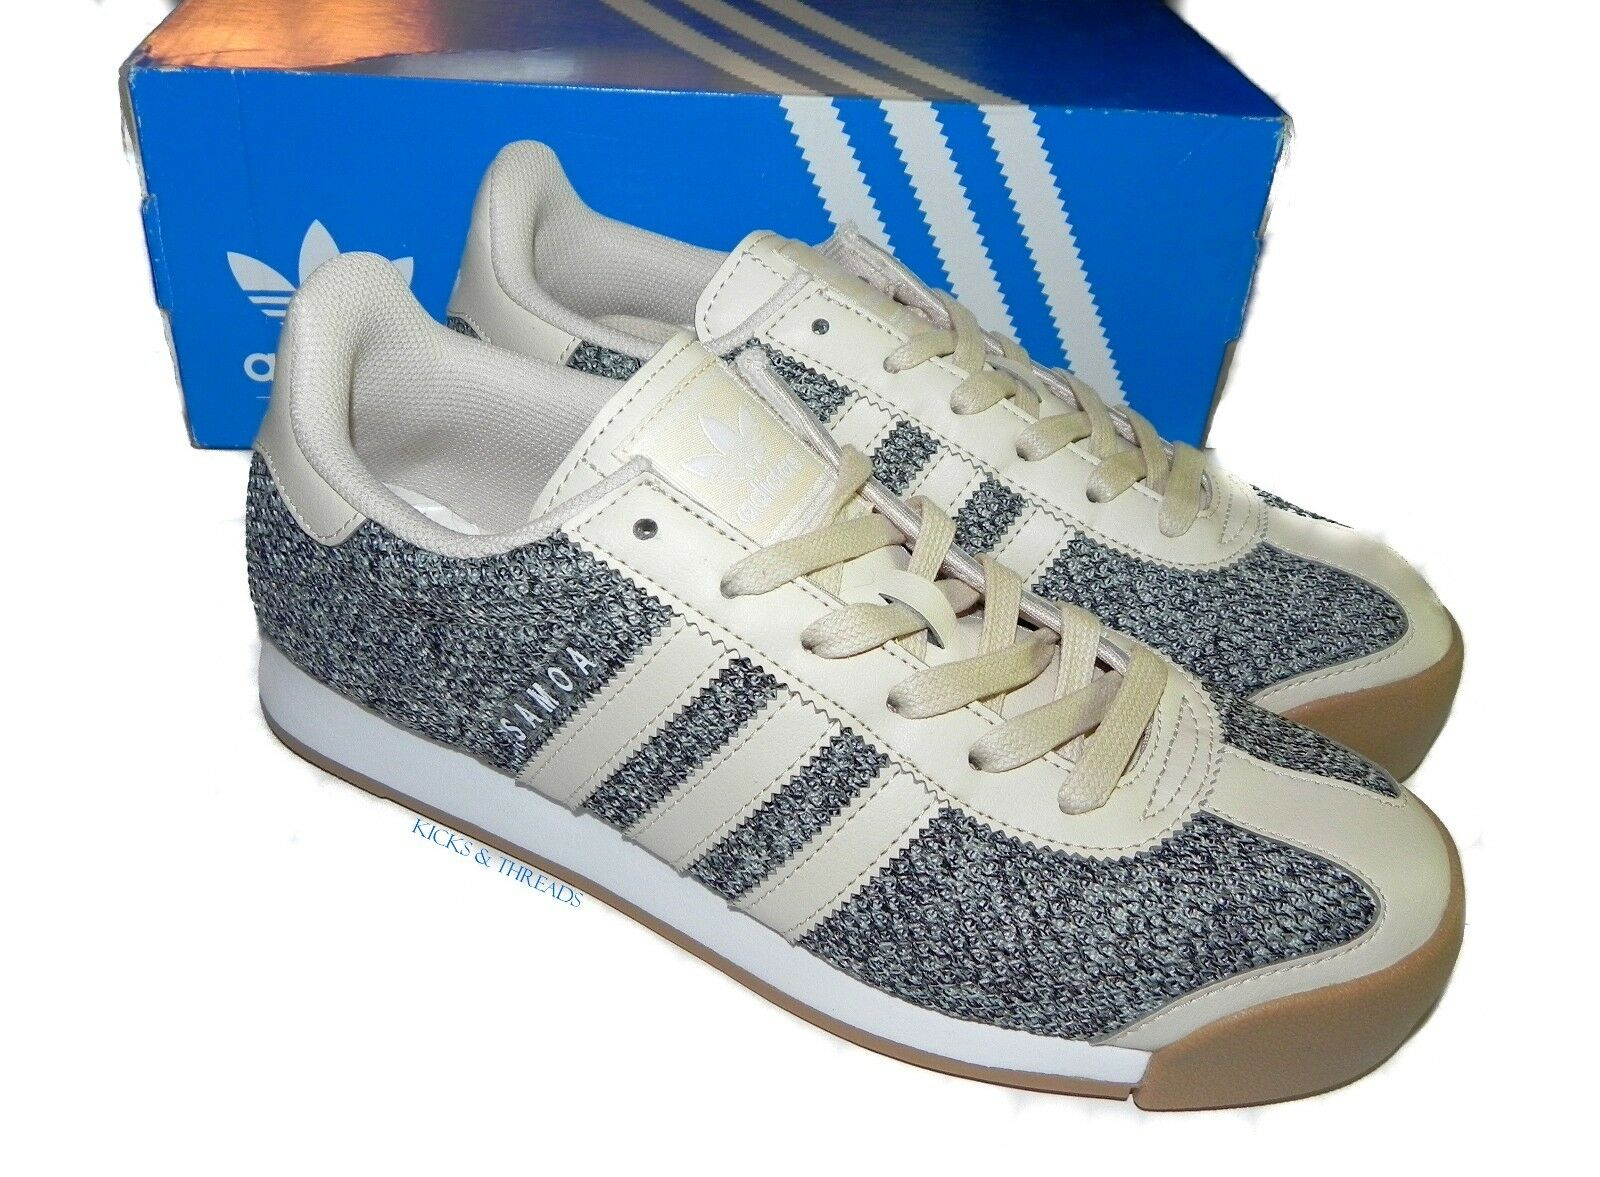 Adidas Originales Samoa bb8613 ropa goma de mujer gris de goma ropa comodo 9f916b